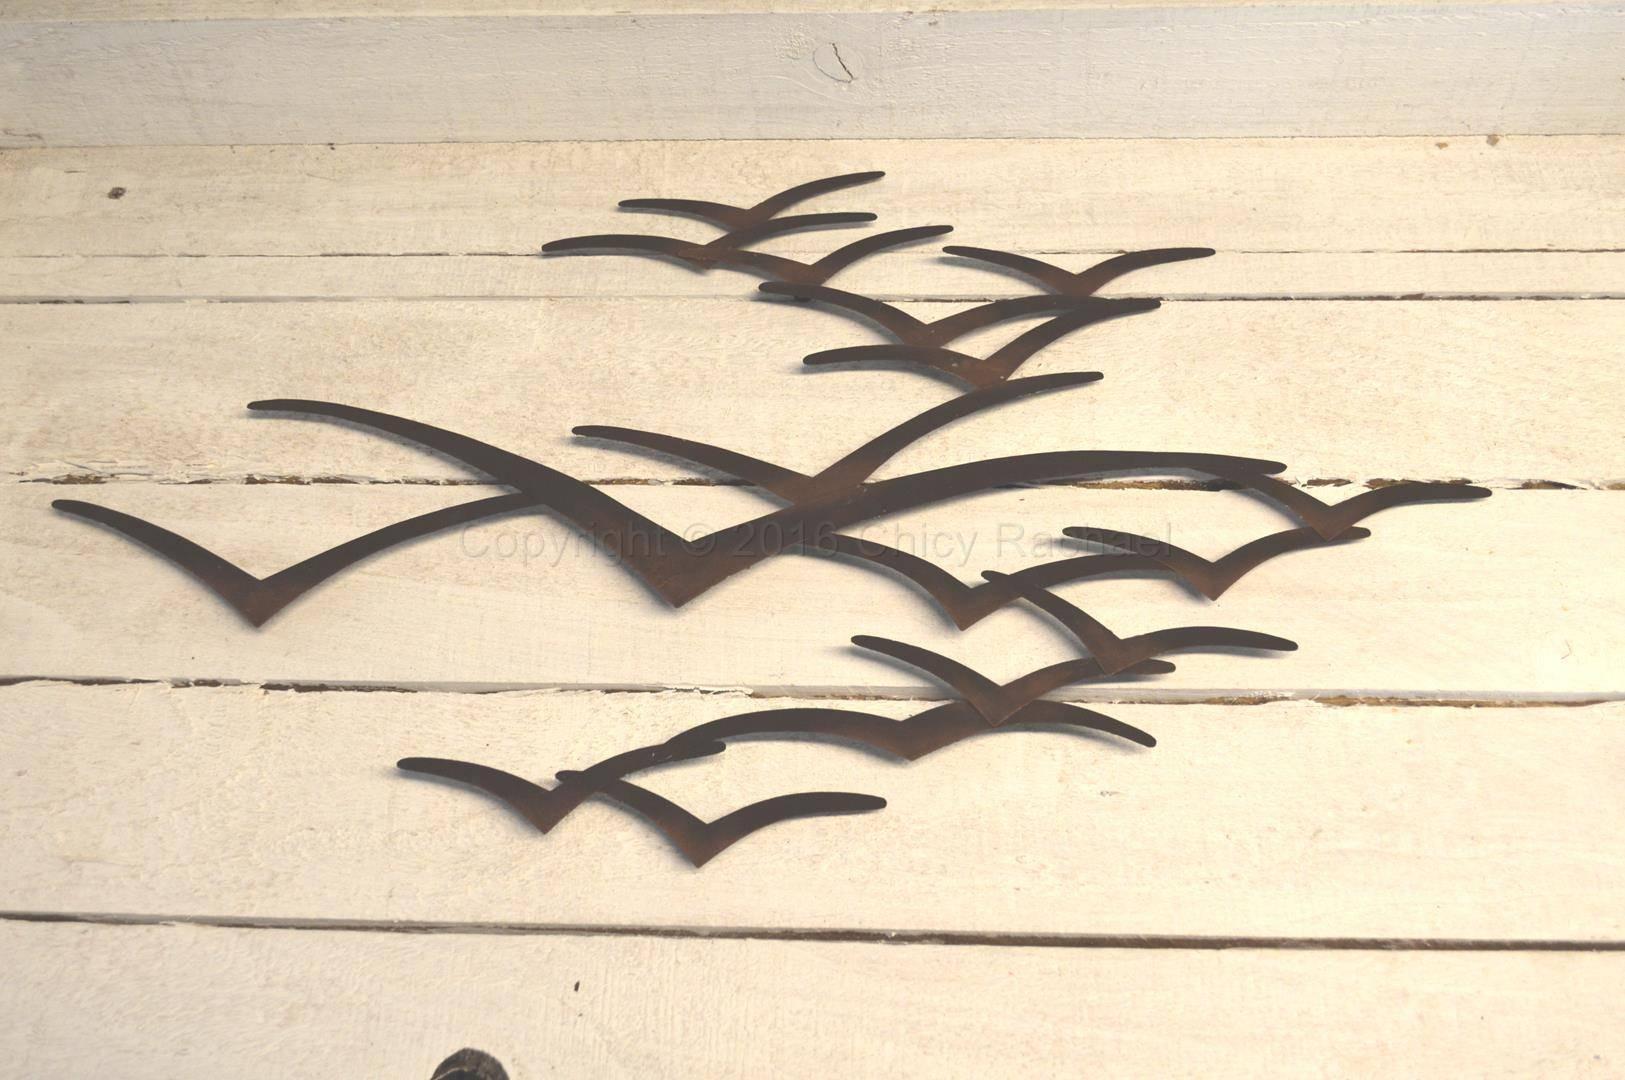 Brown Seagull In Flight Wall Art – Chicy Rachael Regarding Most Popular Seagull Metal Wall Art (View 2 of 20)